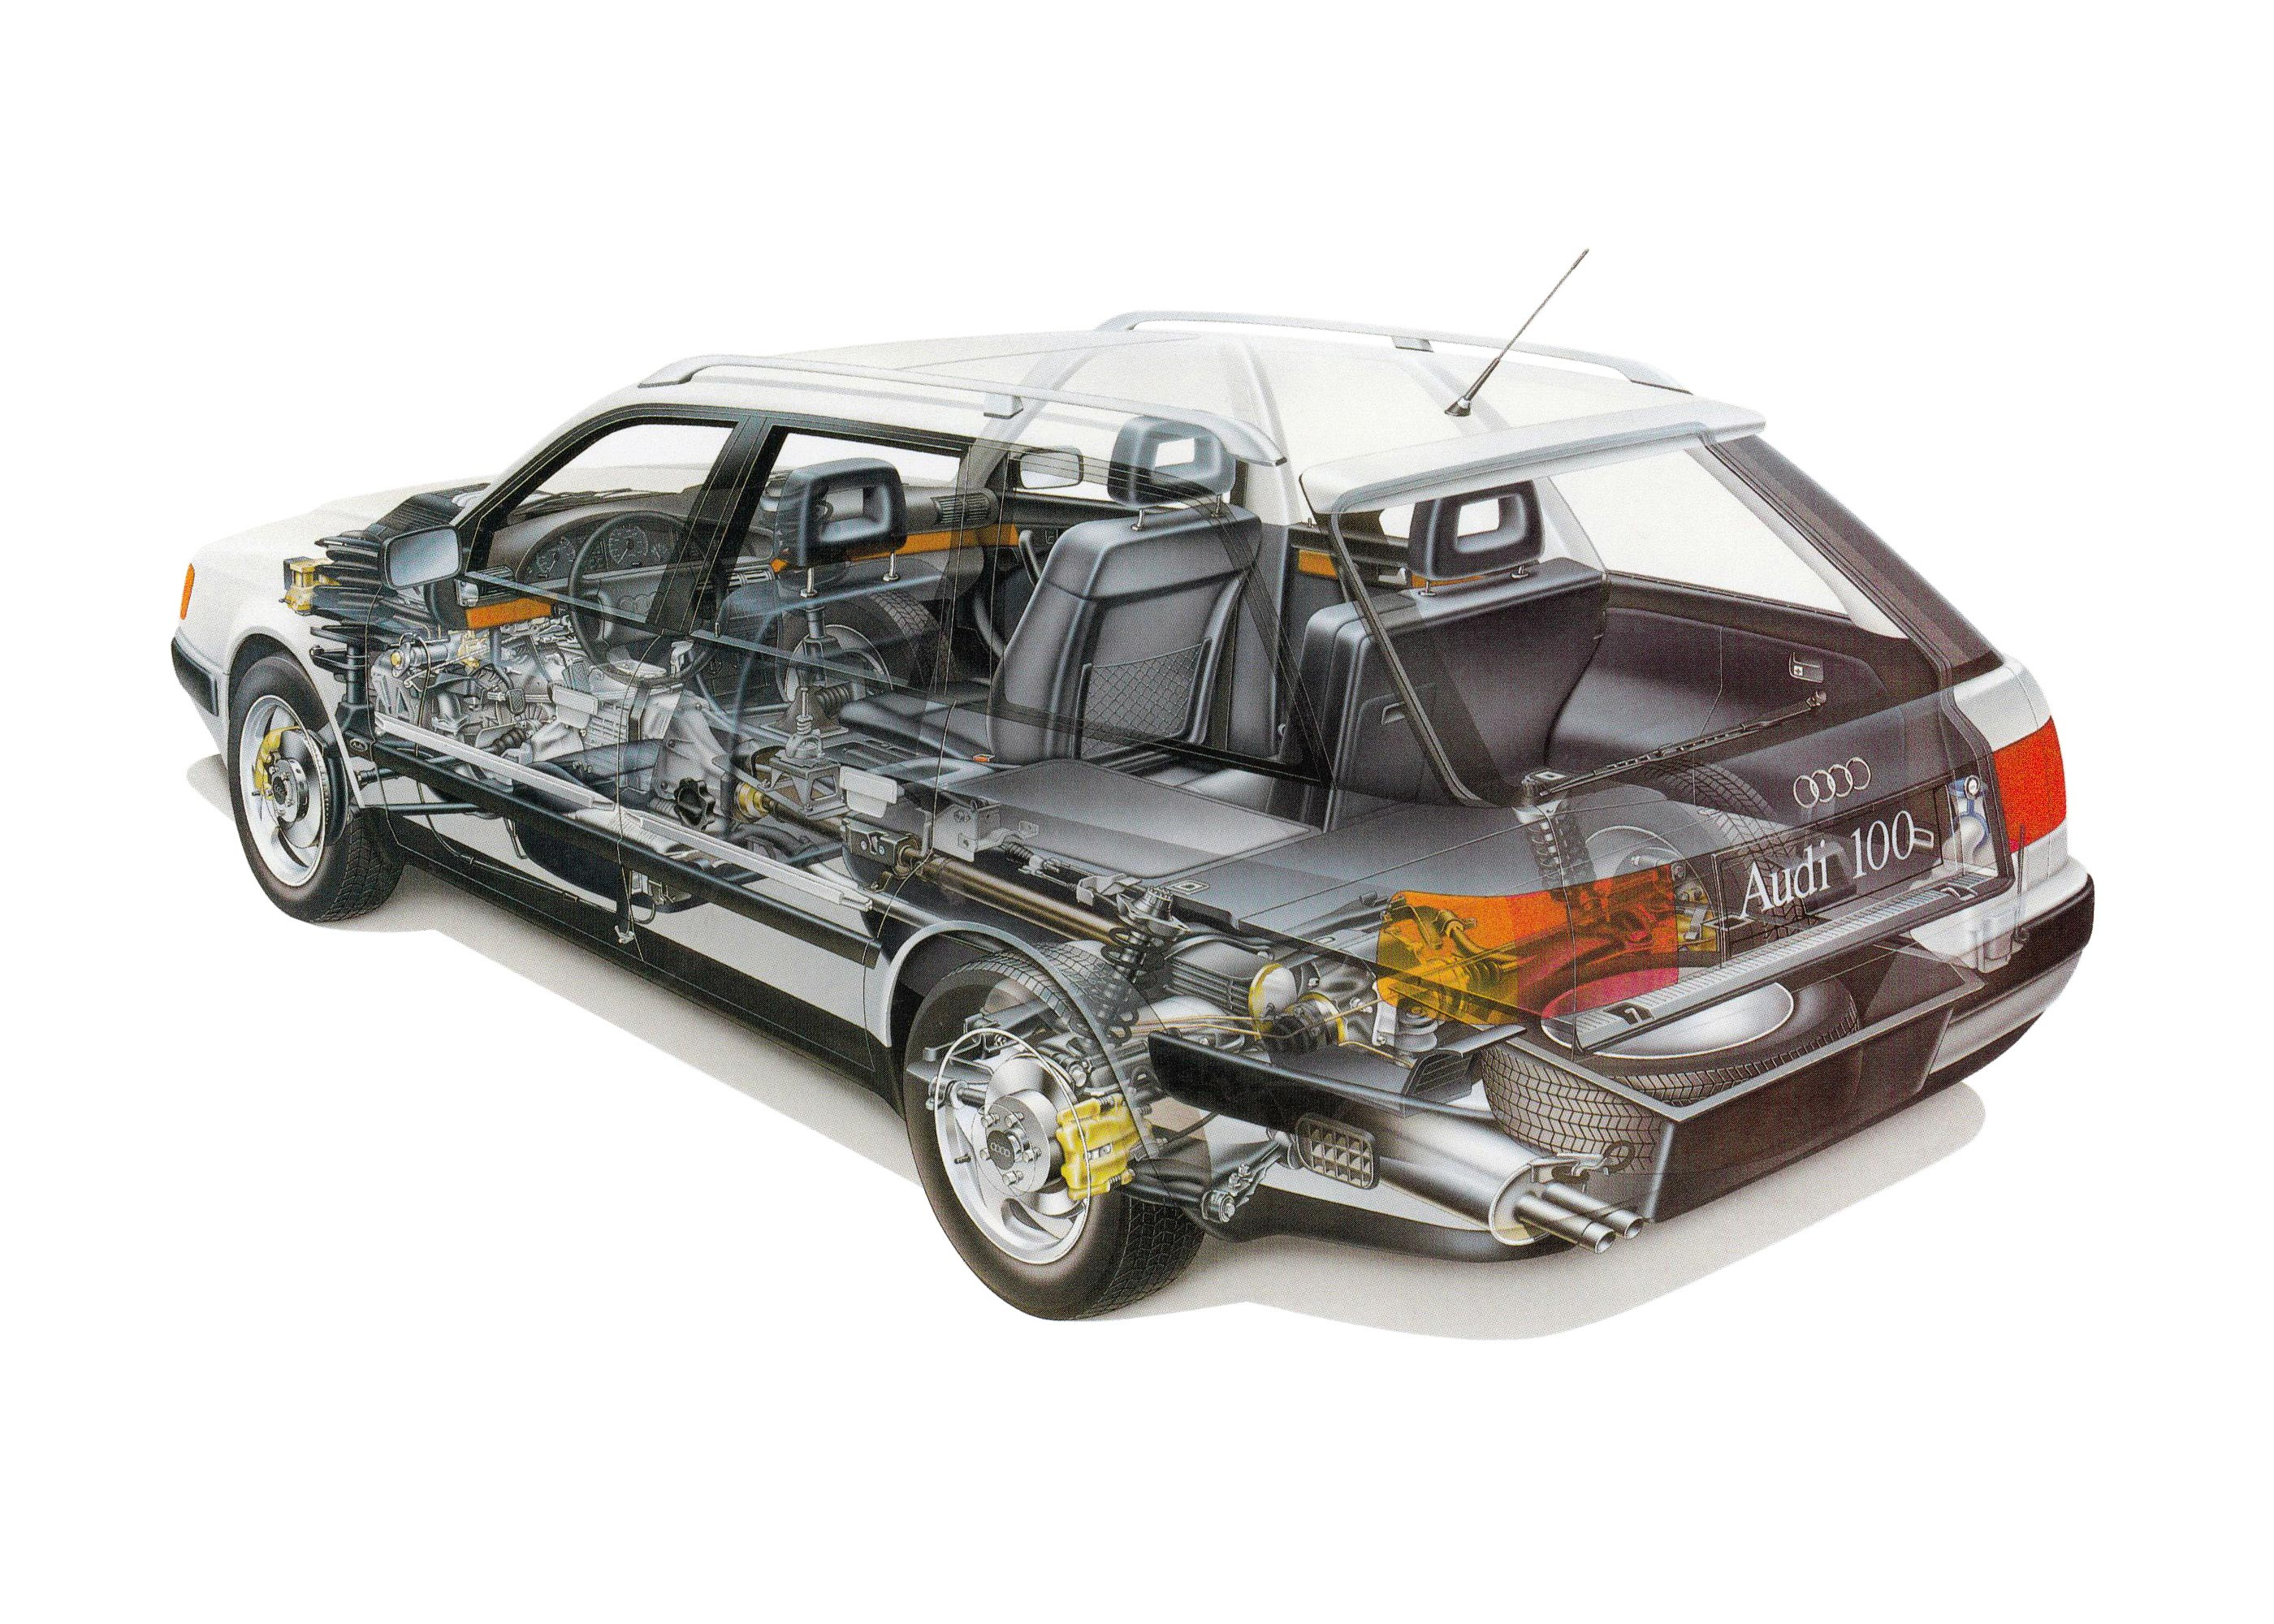 Audi 100 cutaway drawing